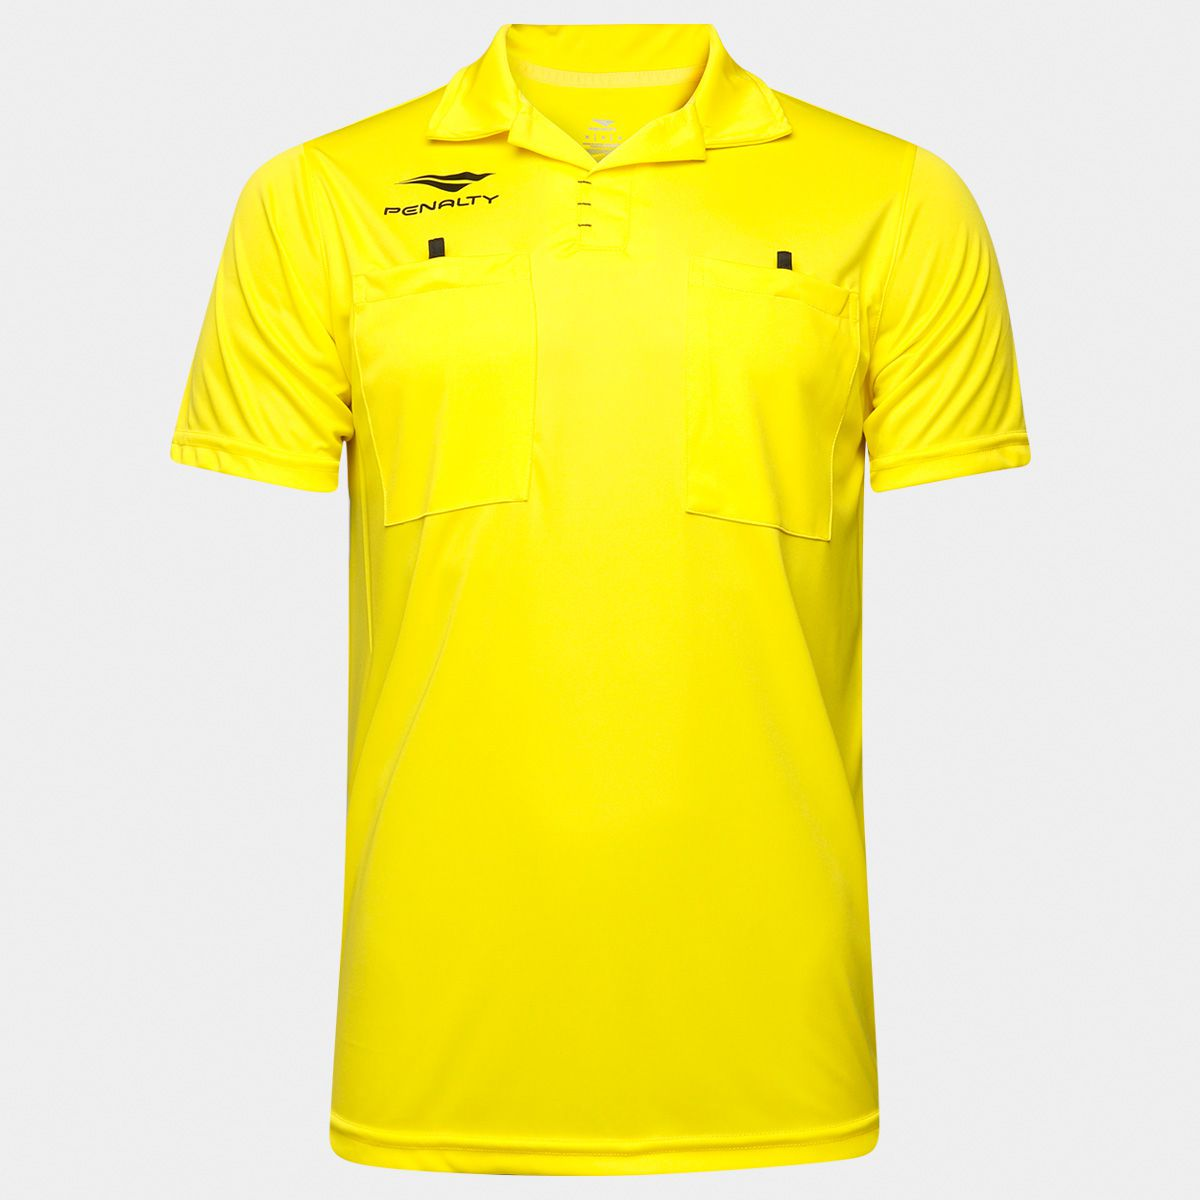 Kit Camisa de Arbitro Juiz Penalty VI + Cartão de Árbitro Penalty